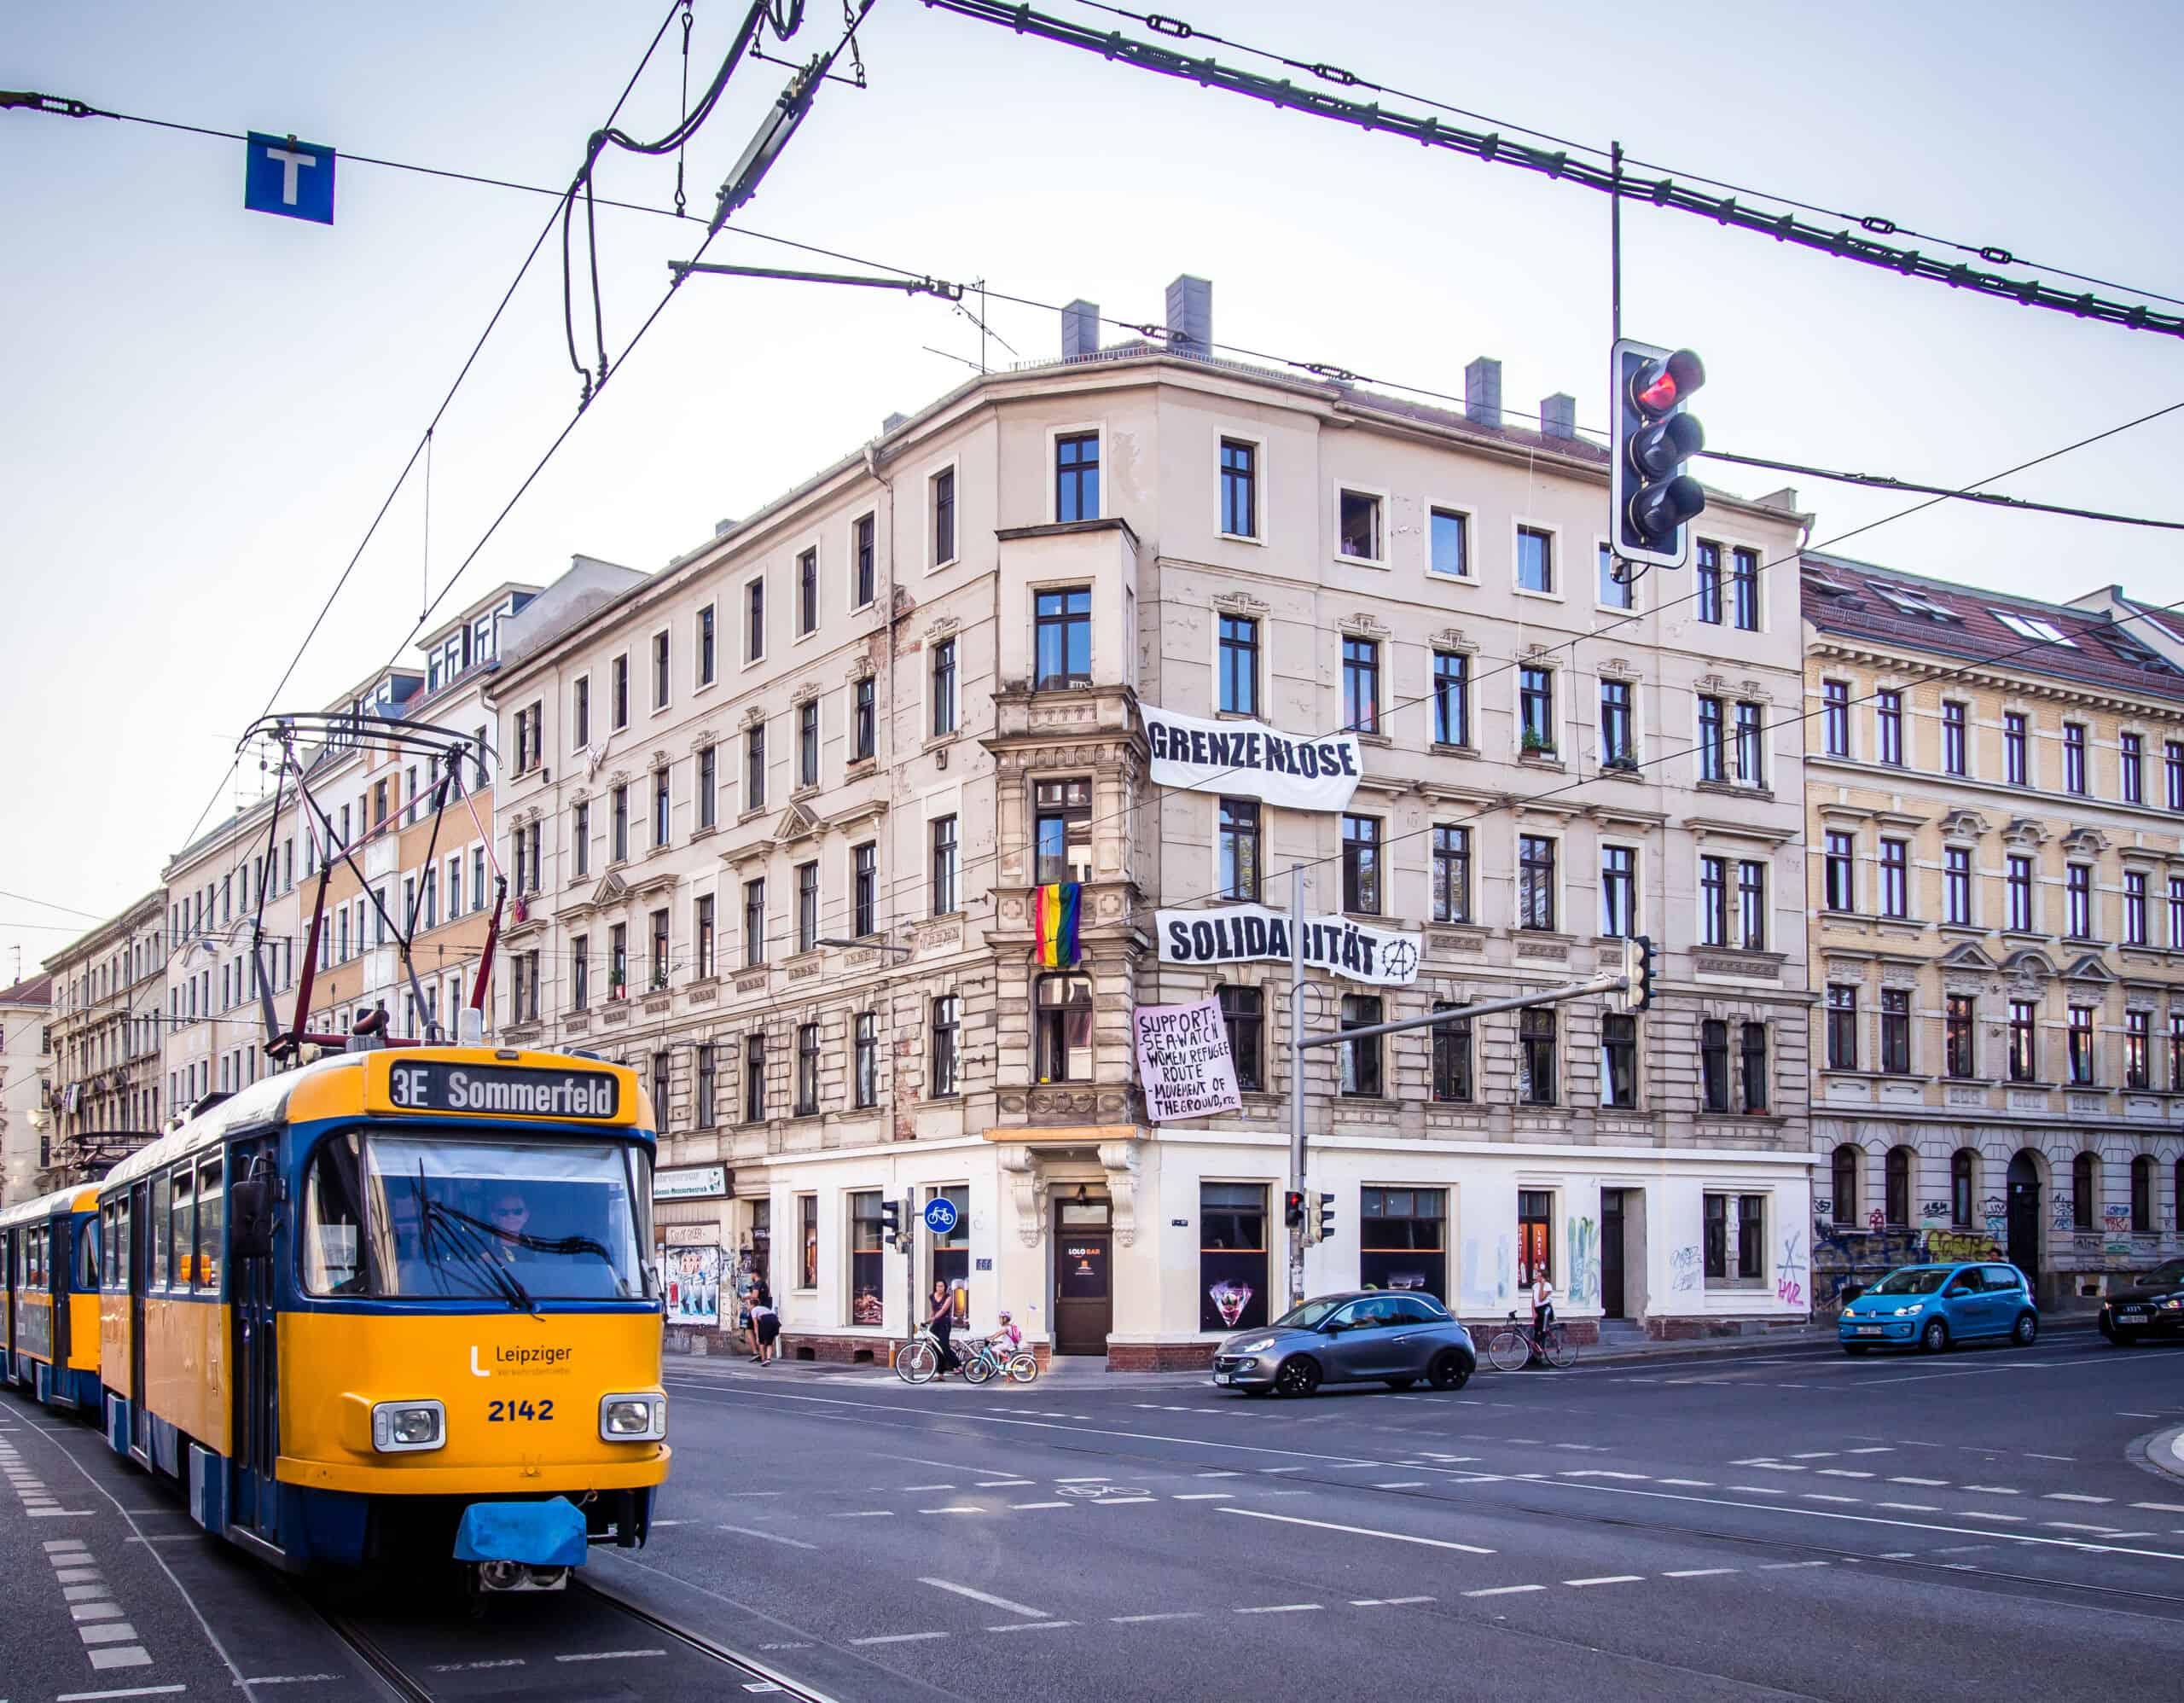 Tatra Tram Leipzig